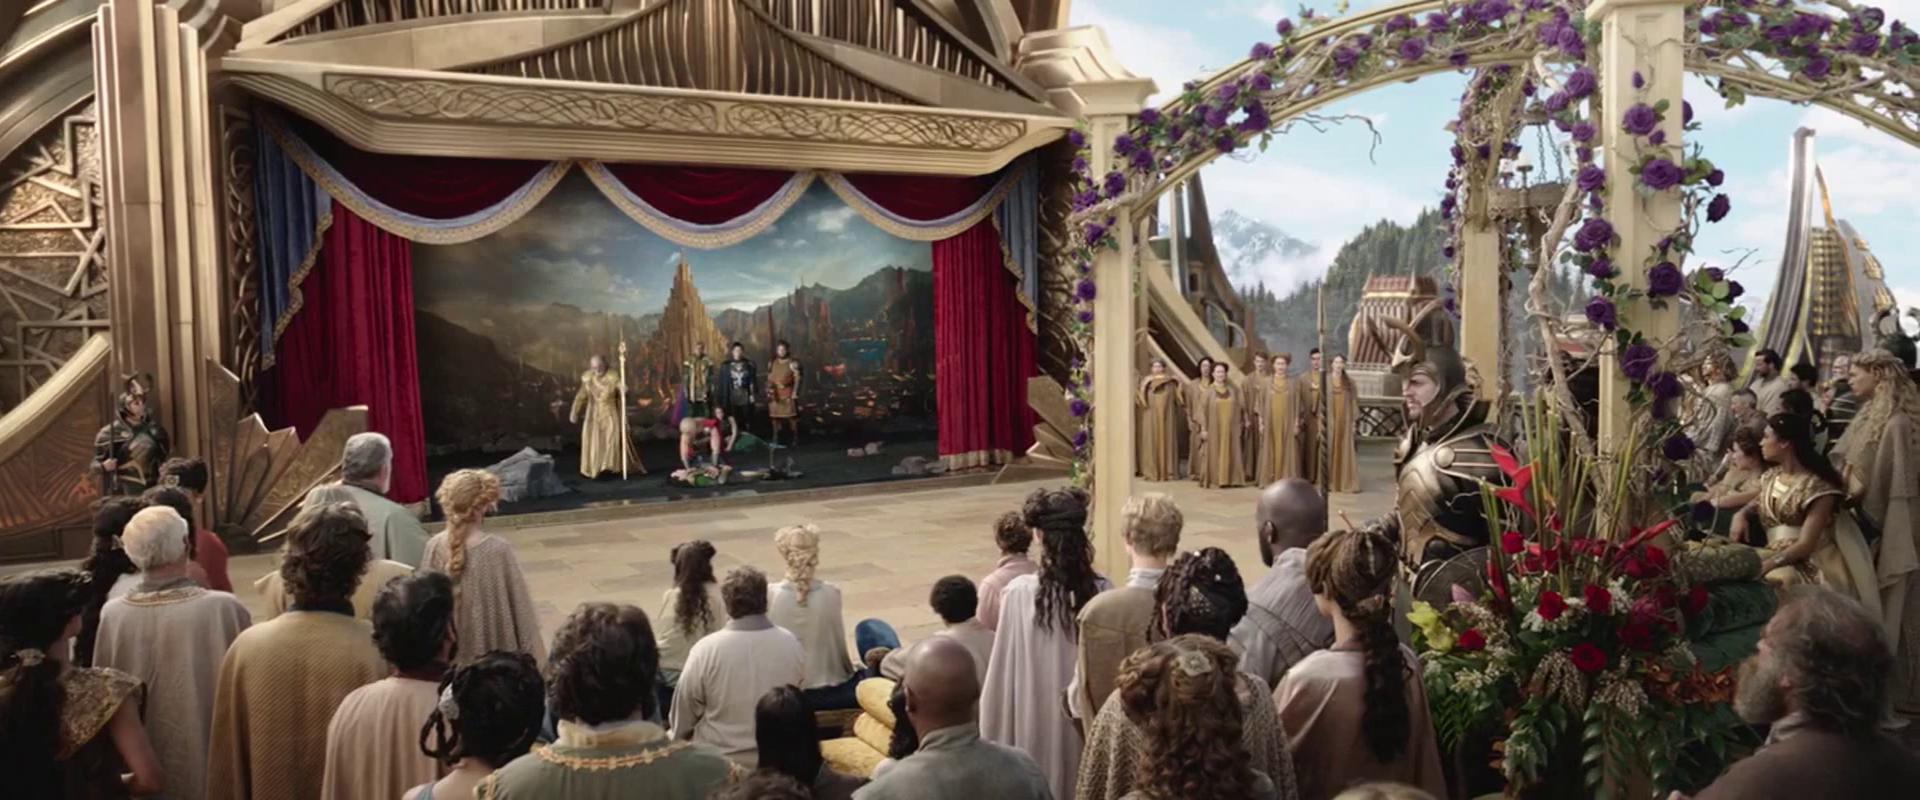 Asgardian Theater